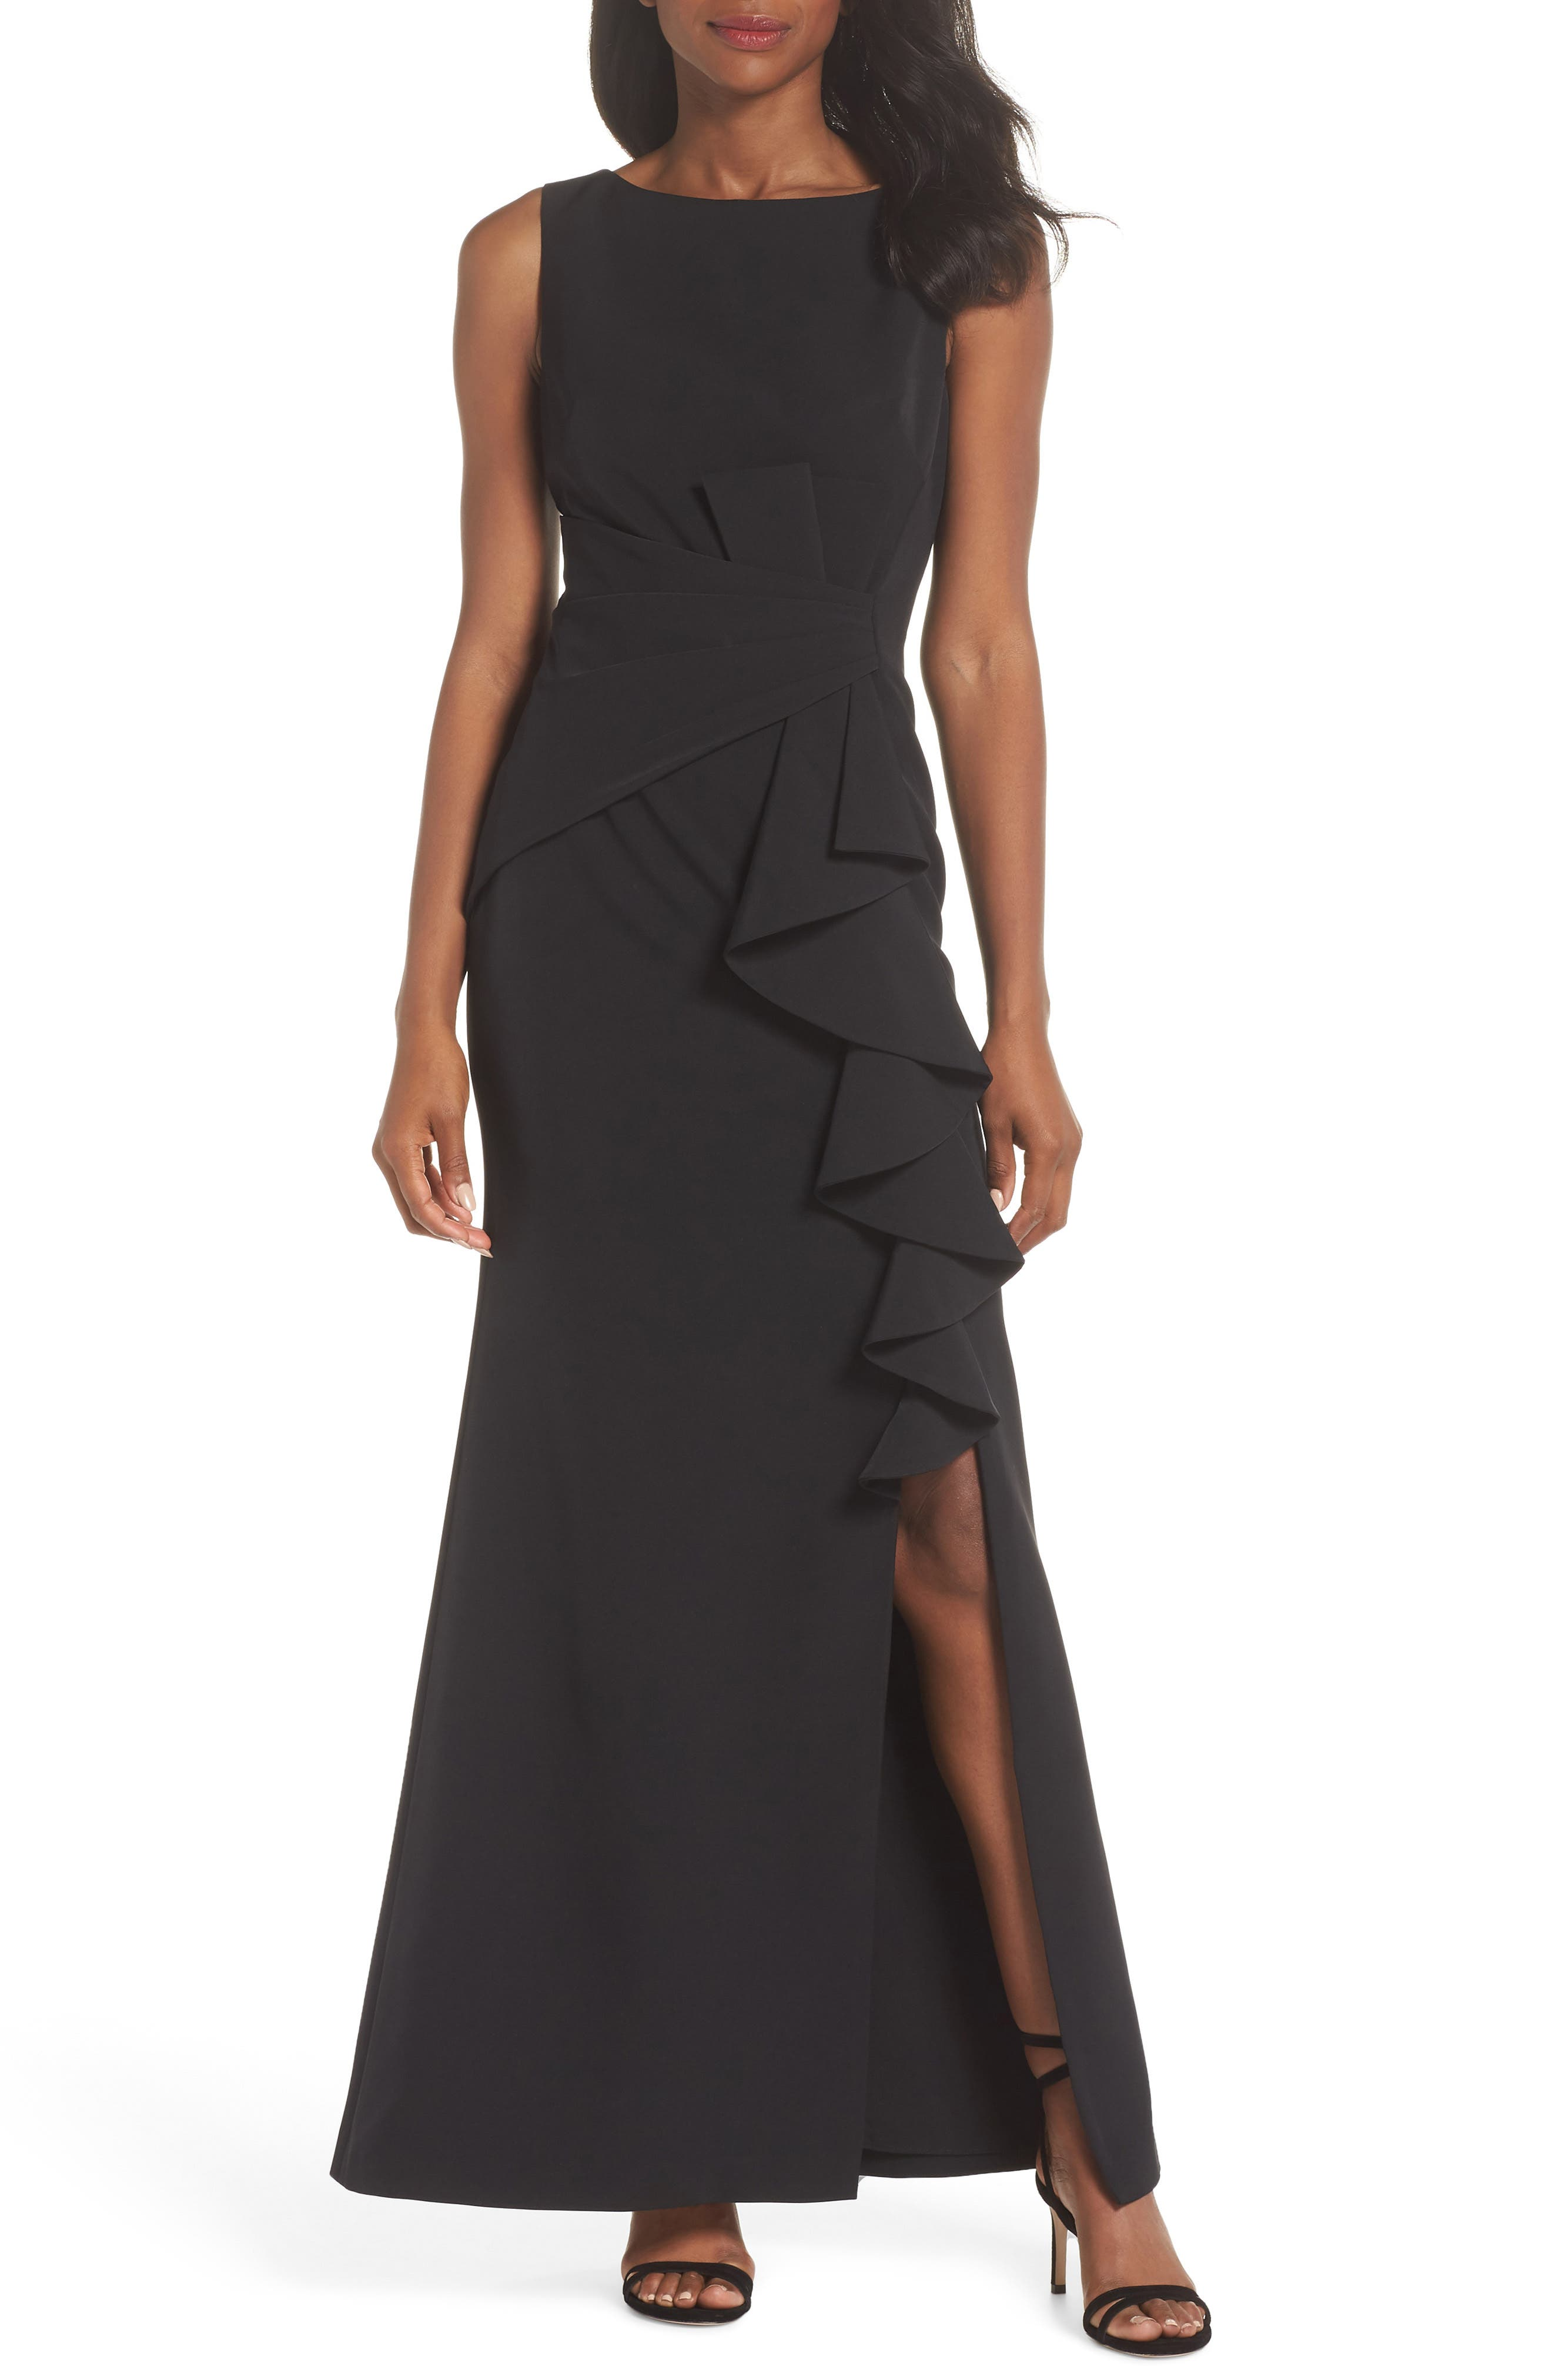 ELIZA J, Ruffle Front Gown, Main thumbnail 1, color, BLACK